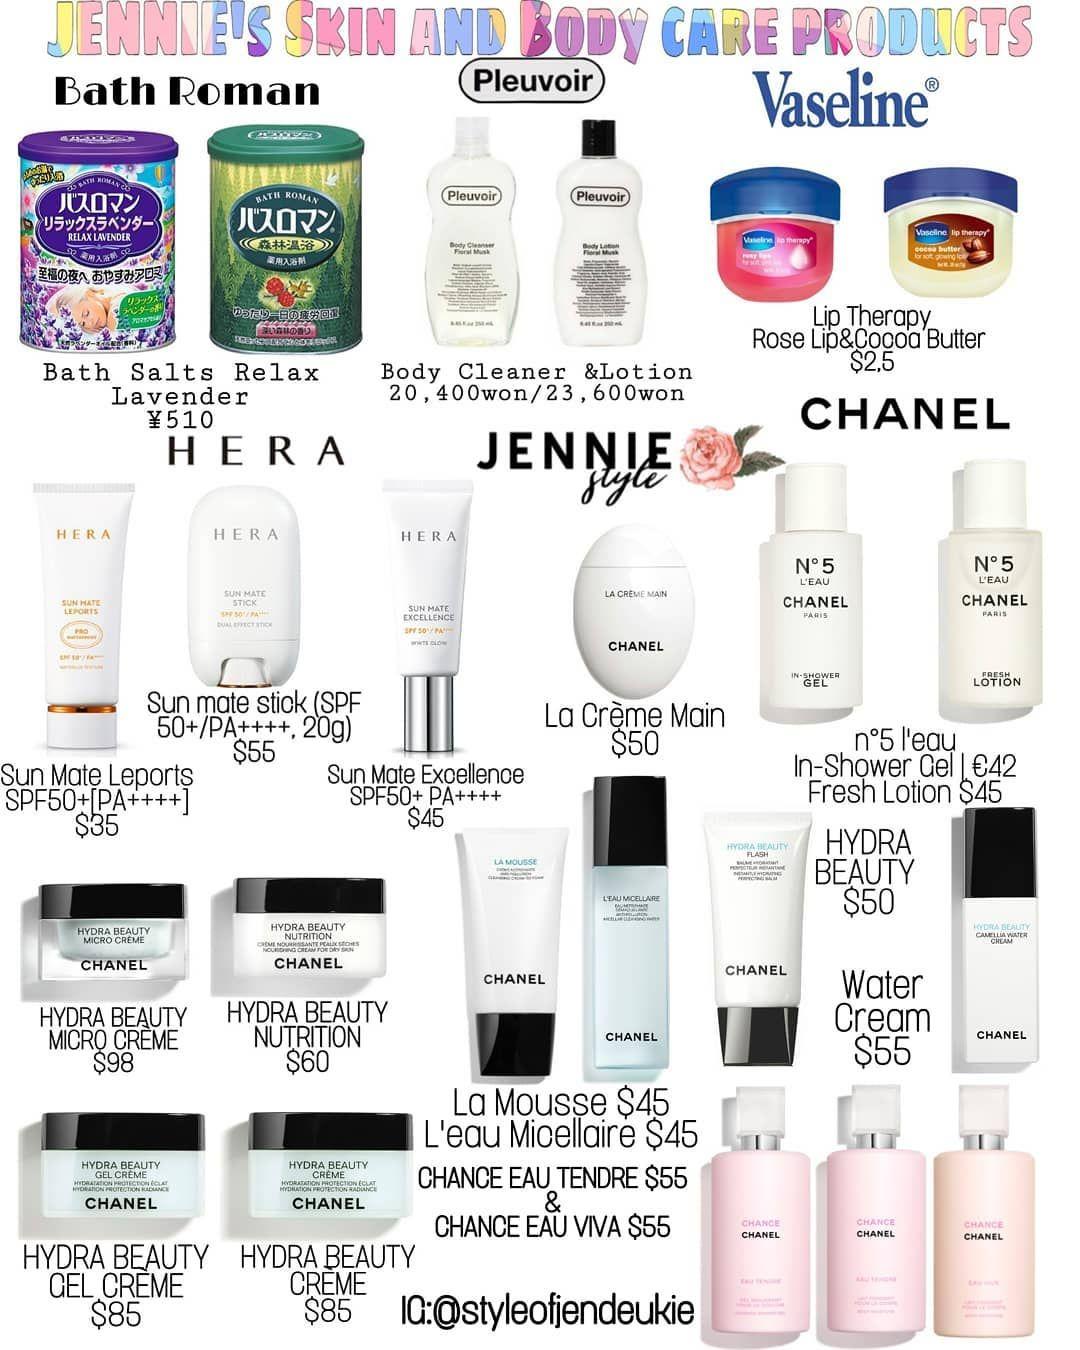 Jennie Kim Style On Instagram Jennie S Skin And Body Care Products Blackpink Blackpinkstyle Blackp Perawatan Kulit Perawatan Wajah Wajah